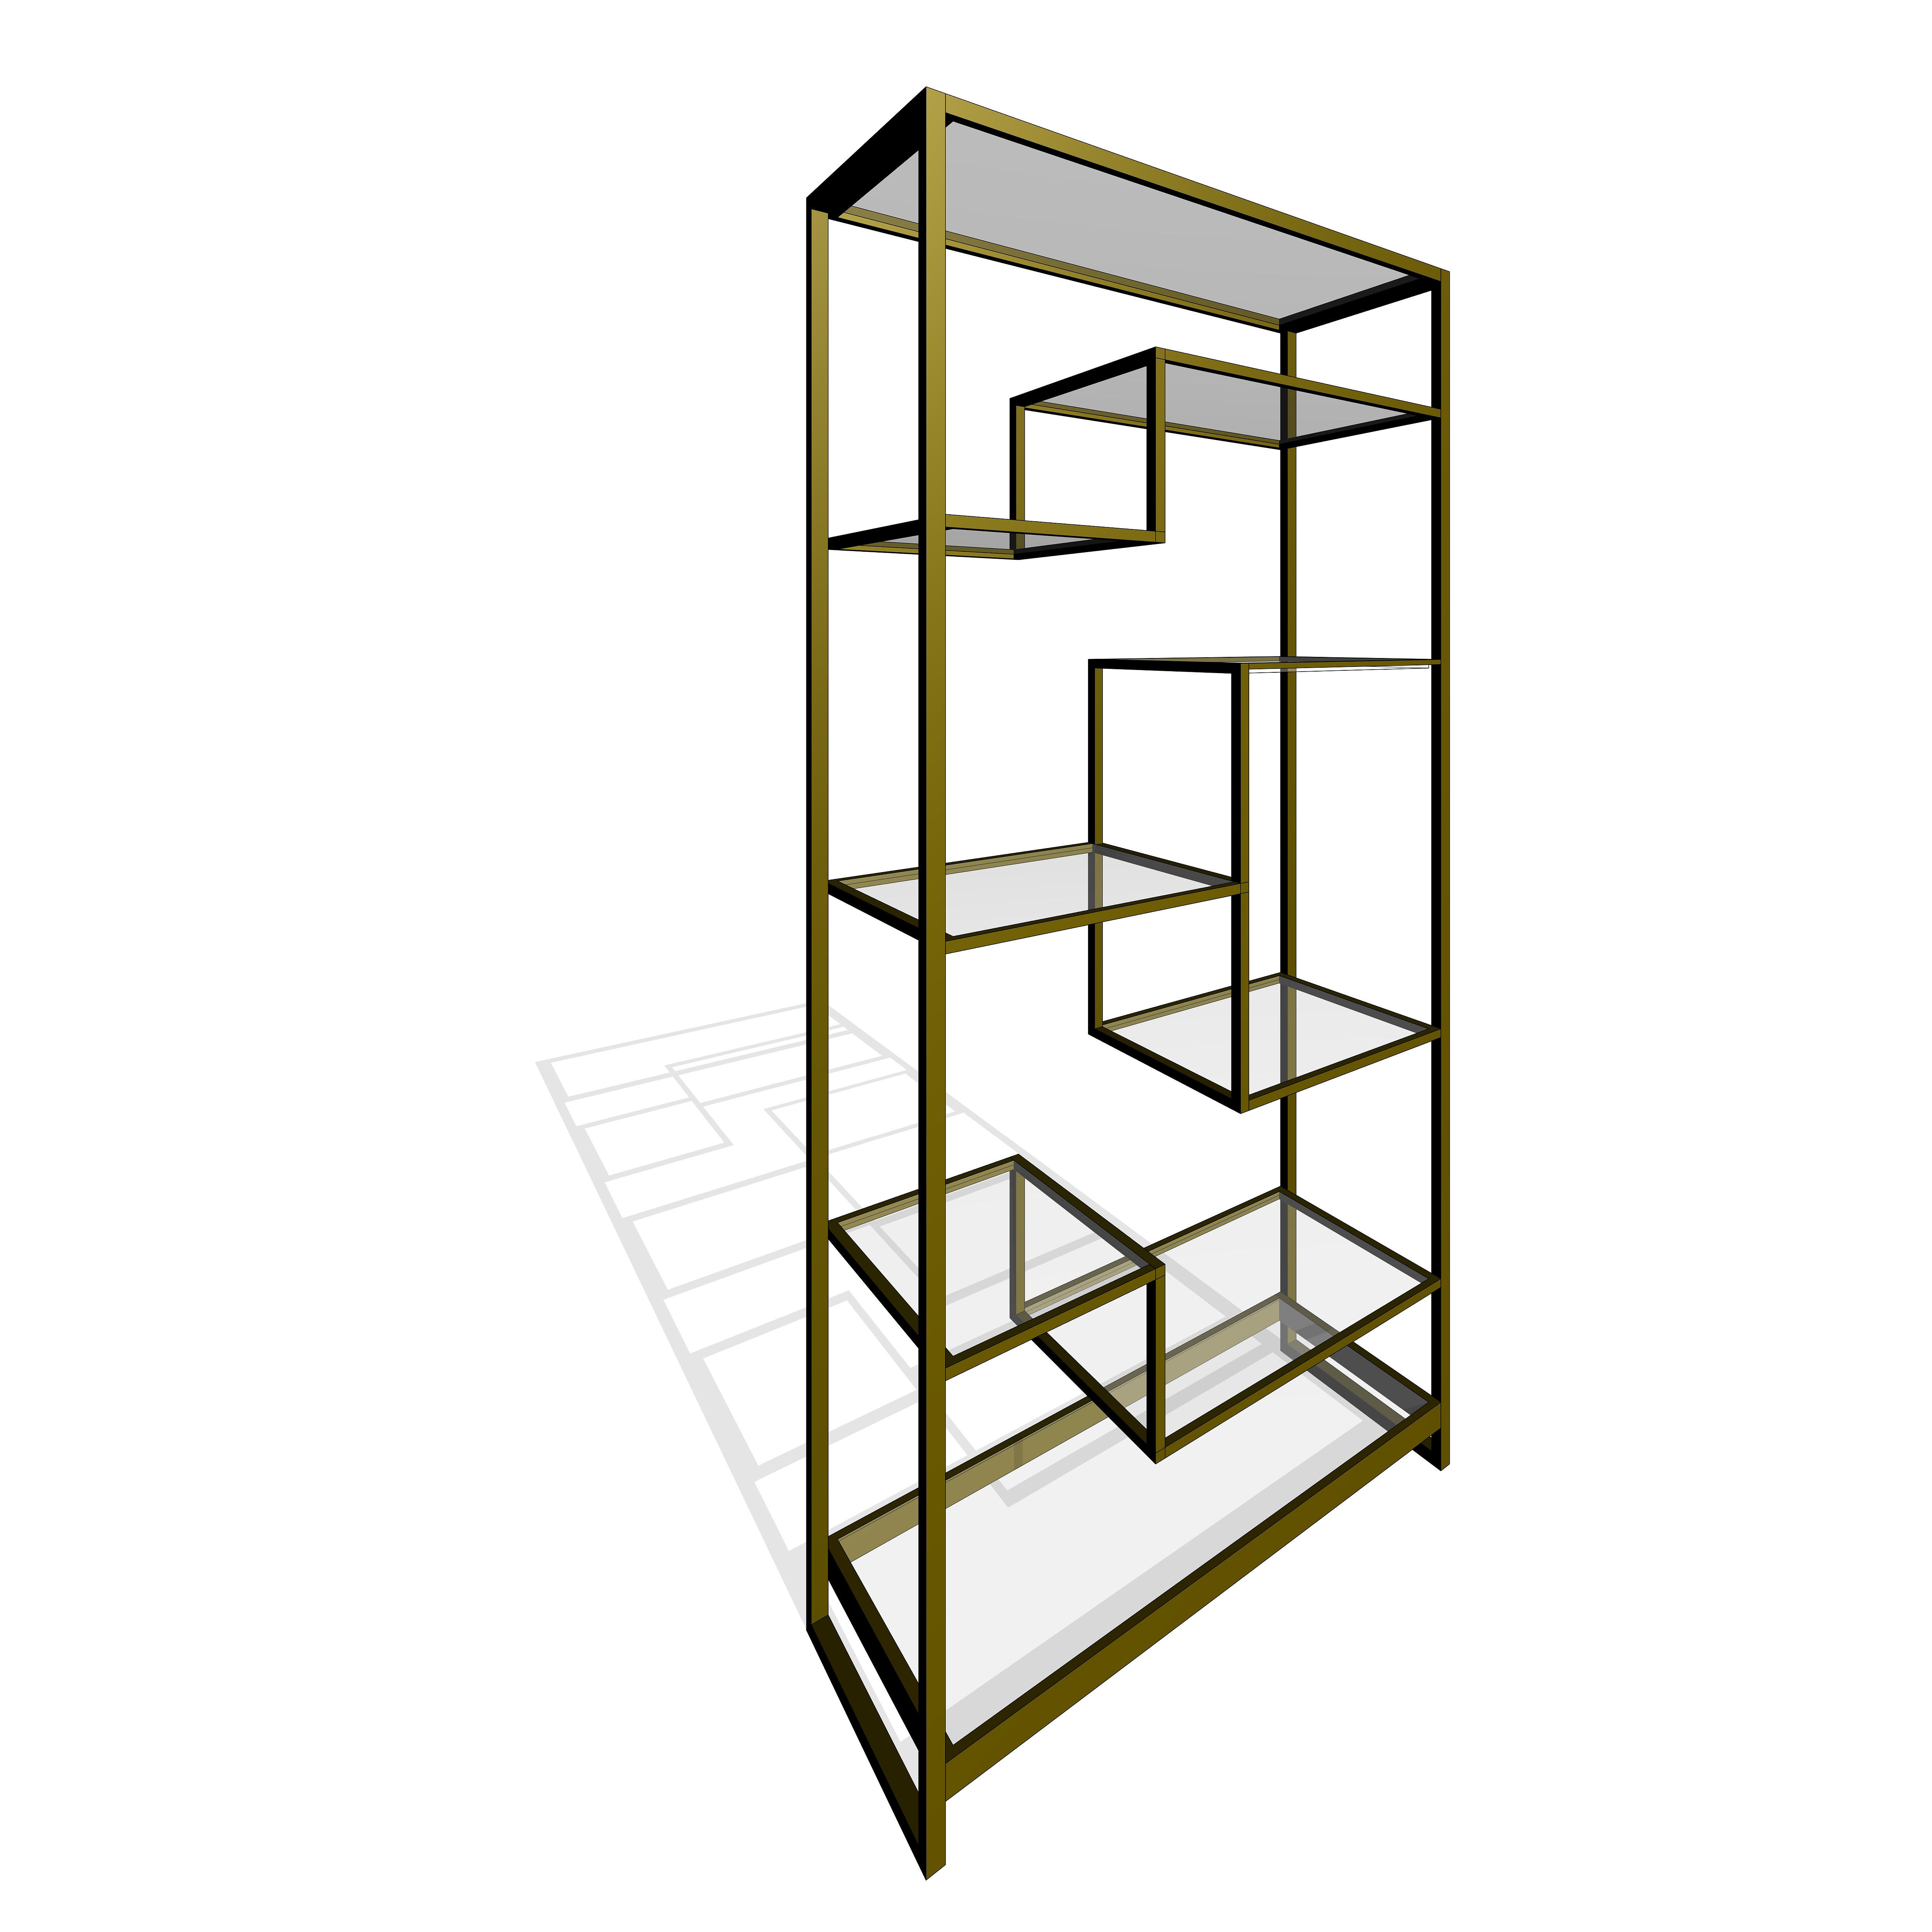 Revit Family Of The Ethan Allen Clarksburg Open Modular Display Bookcase